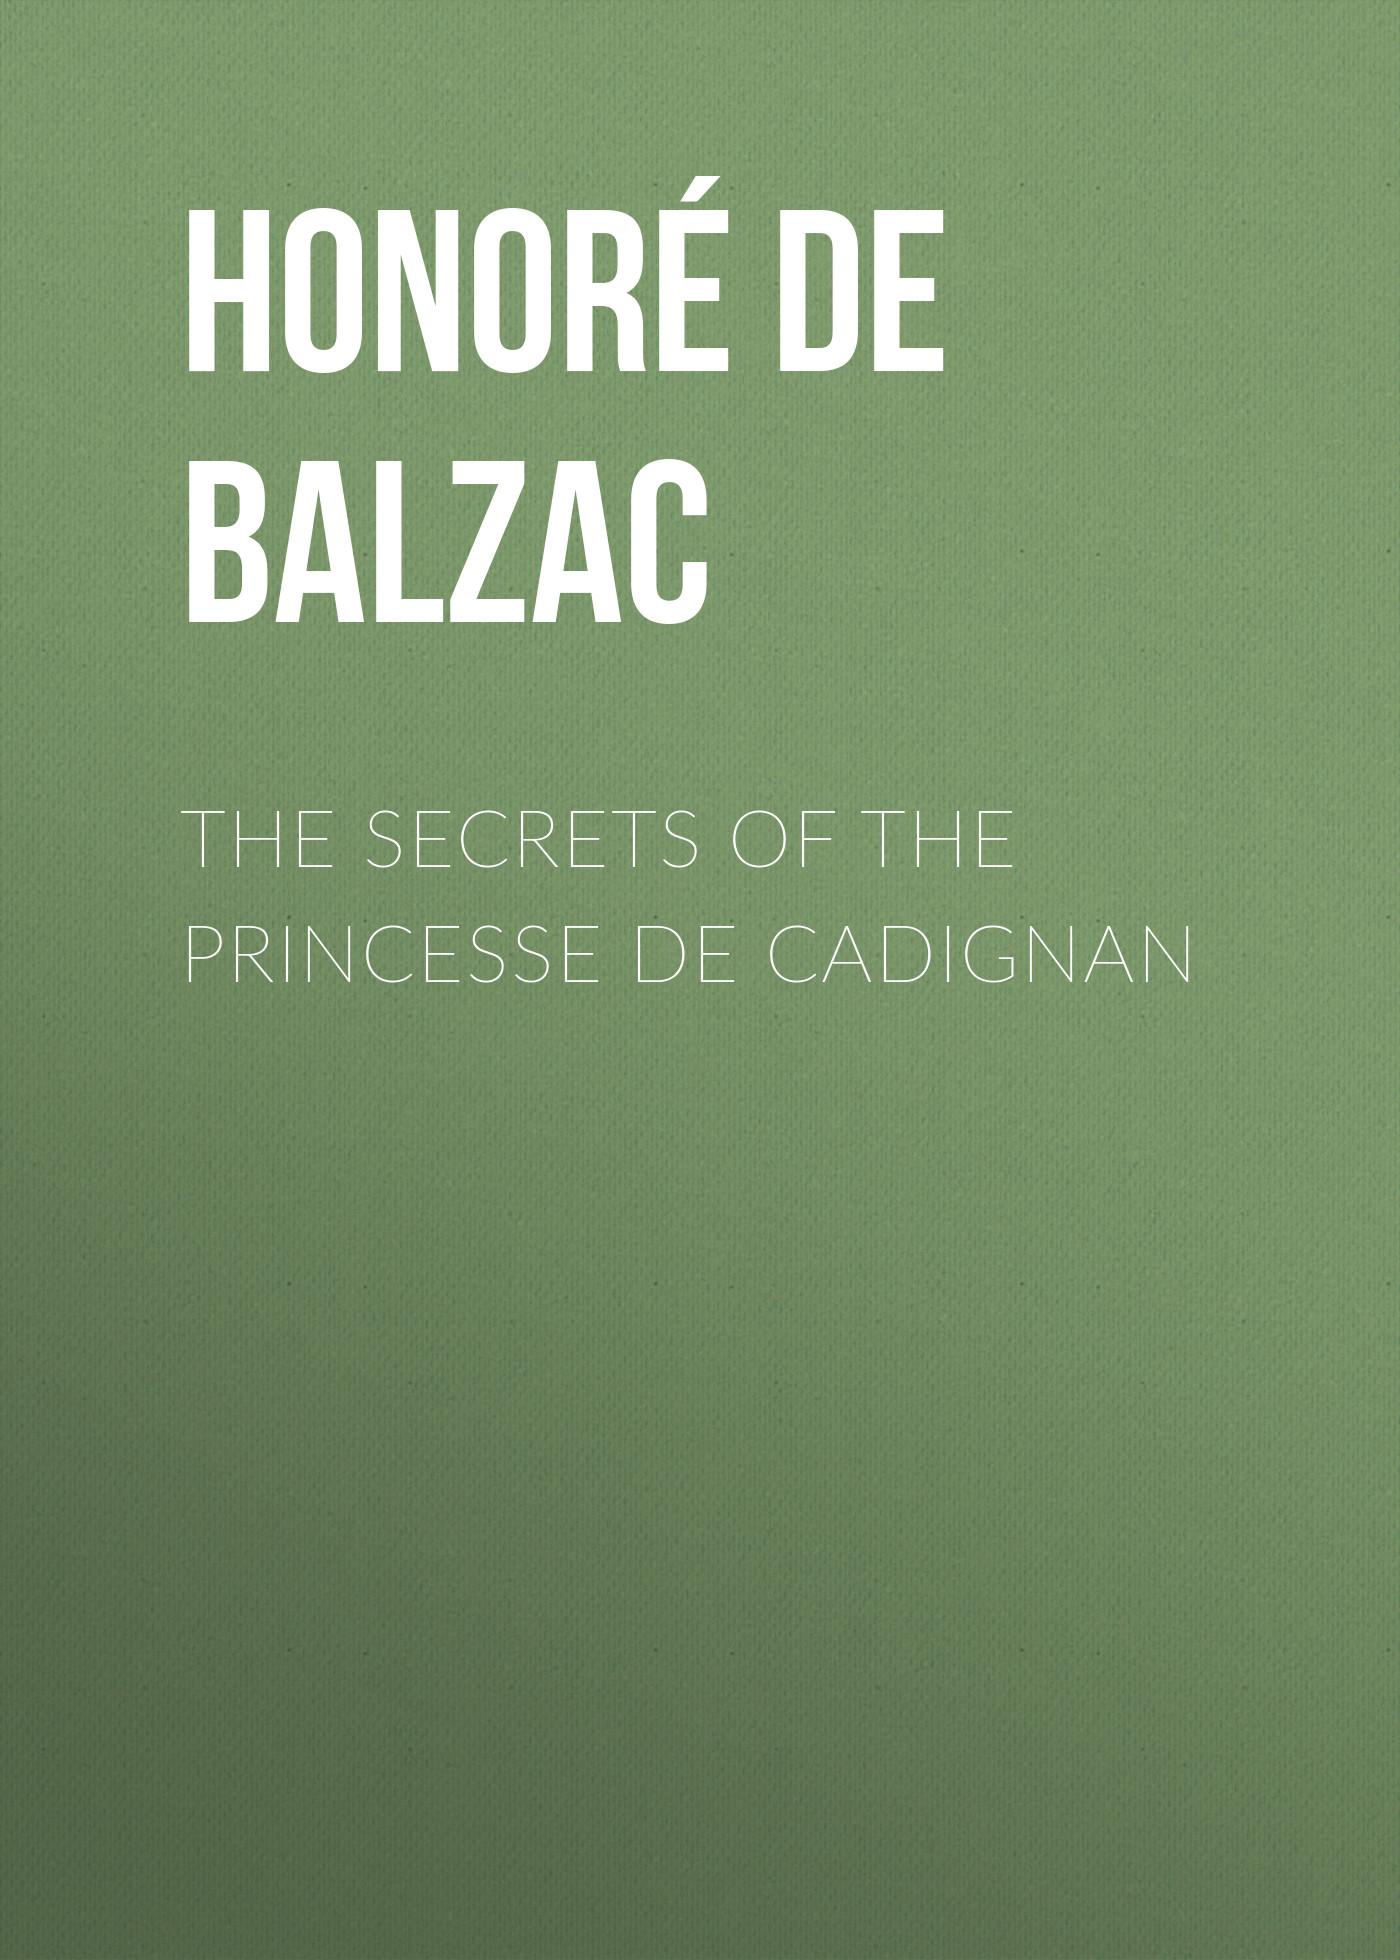 Оноре де Бальзак The Secrets of the Princesse de Cadignan блуза befree befree mp002xw0ygqs